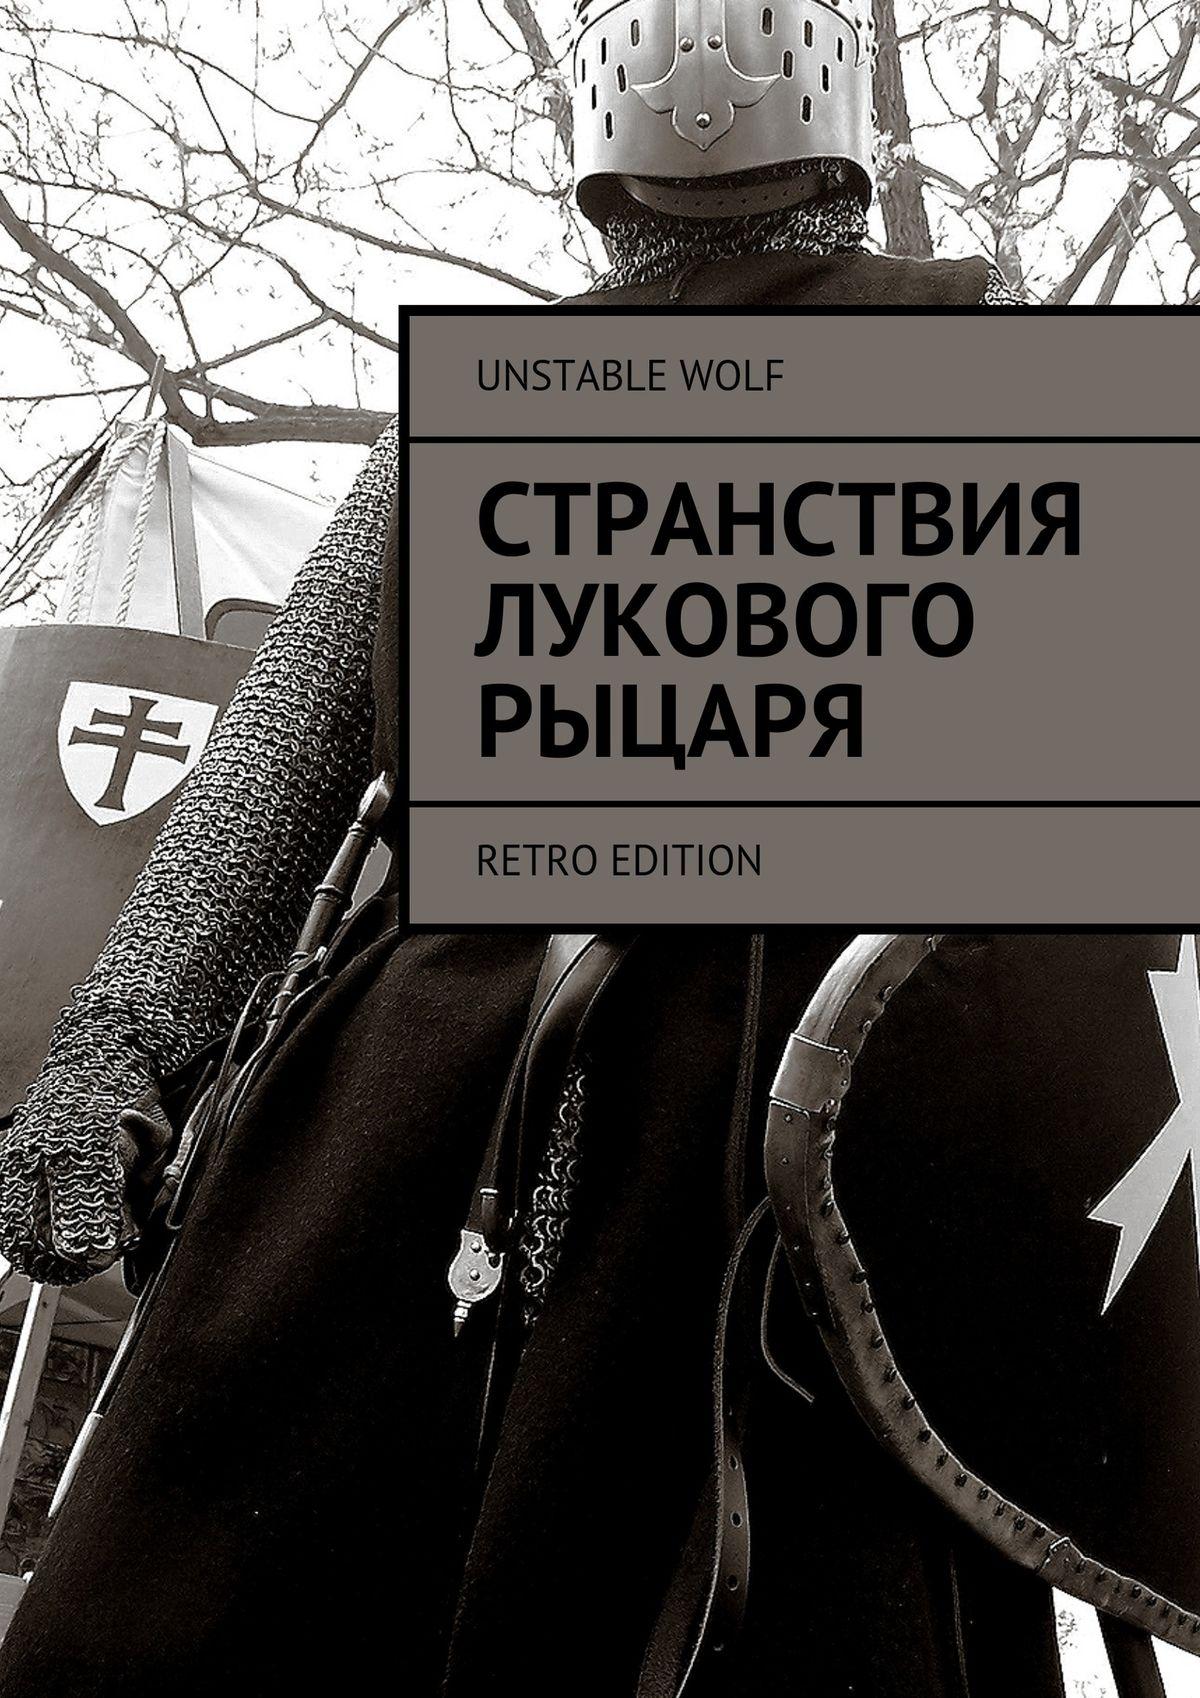 Unstable Wolf Странствия Лукового Рыцаря. Retro Edition